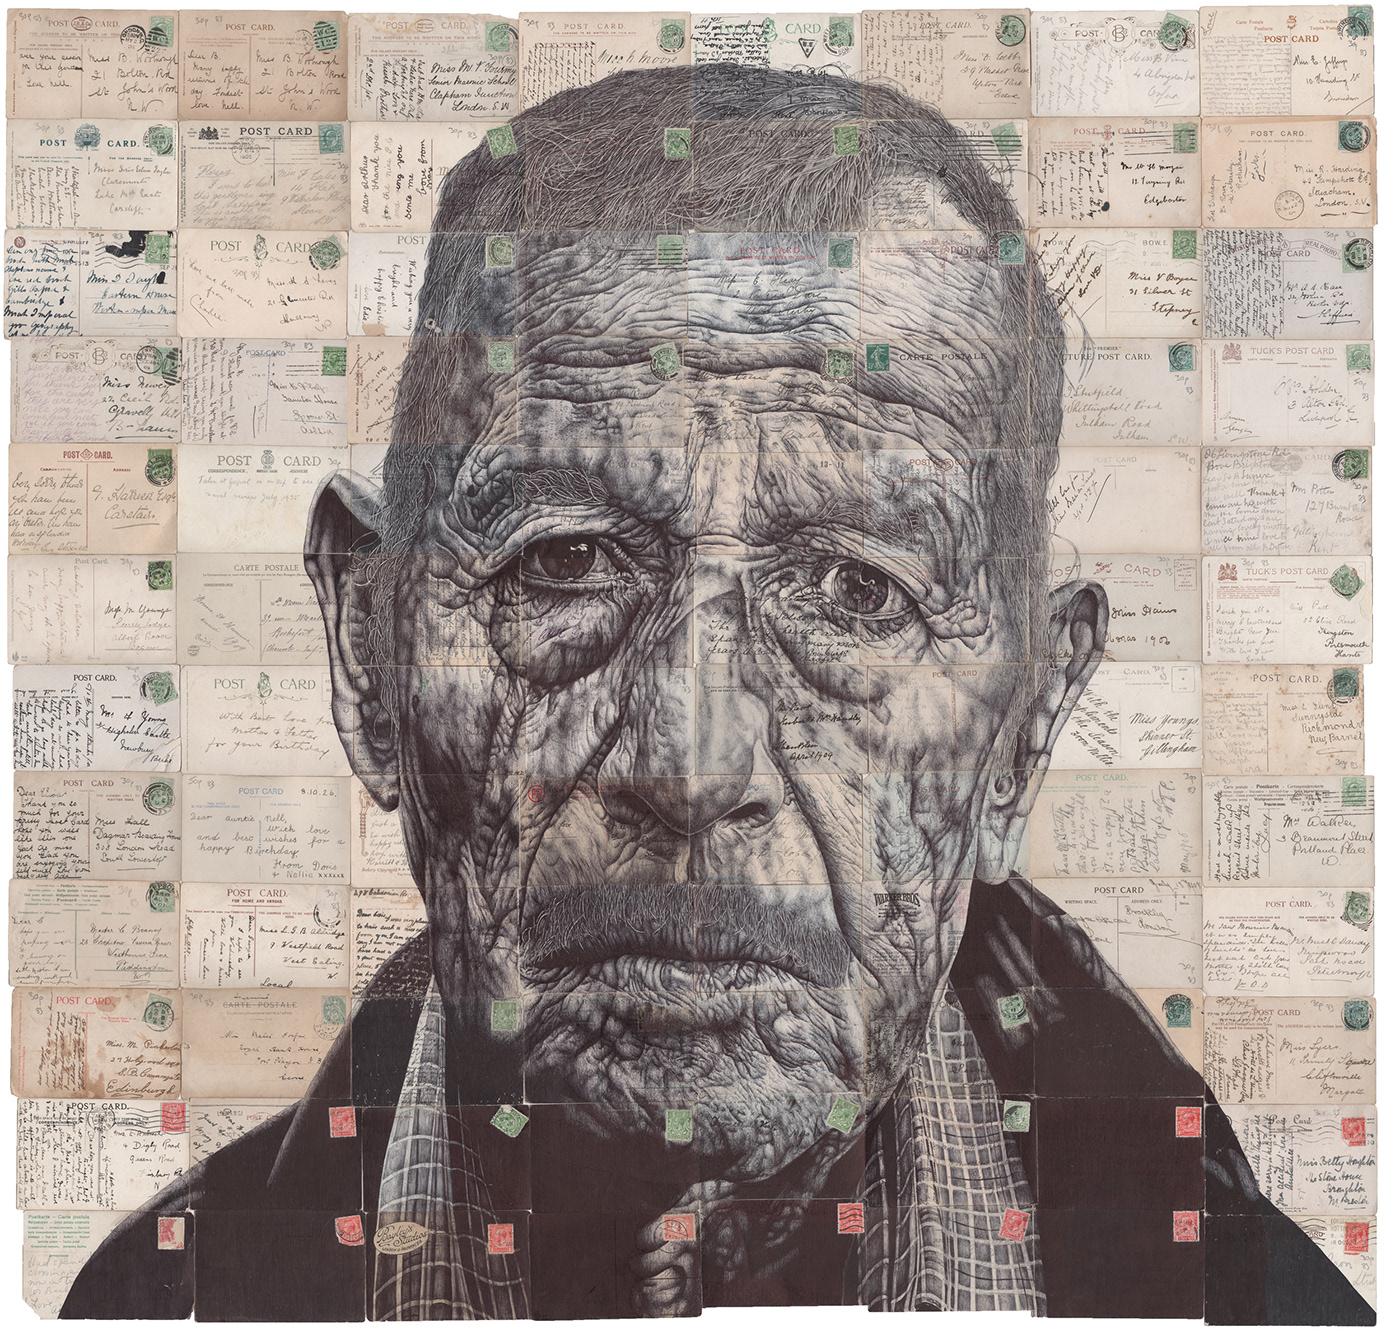 Image may contain: drawing, art and human face